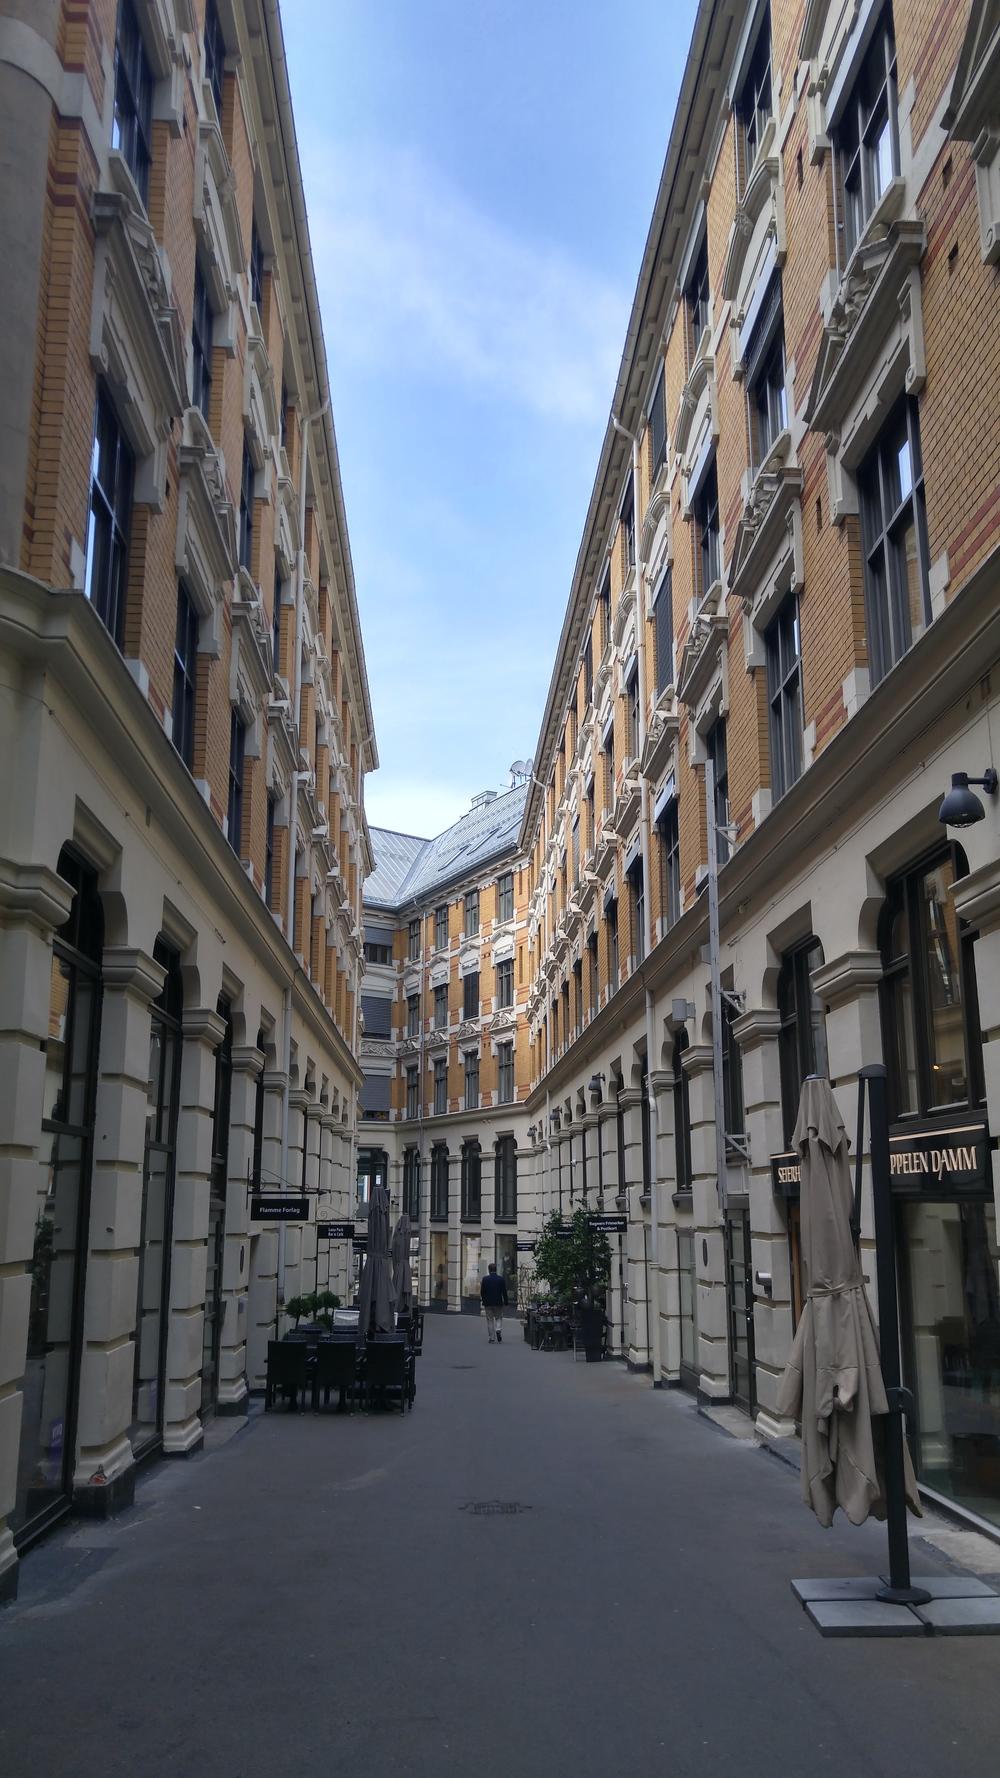 This alleyway referred to as 'City Passage' adjacent to Genson reminds me of Jorcks Passage in Copenhagen.